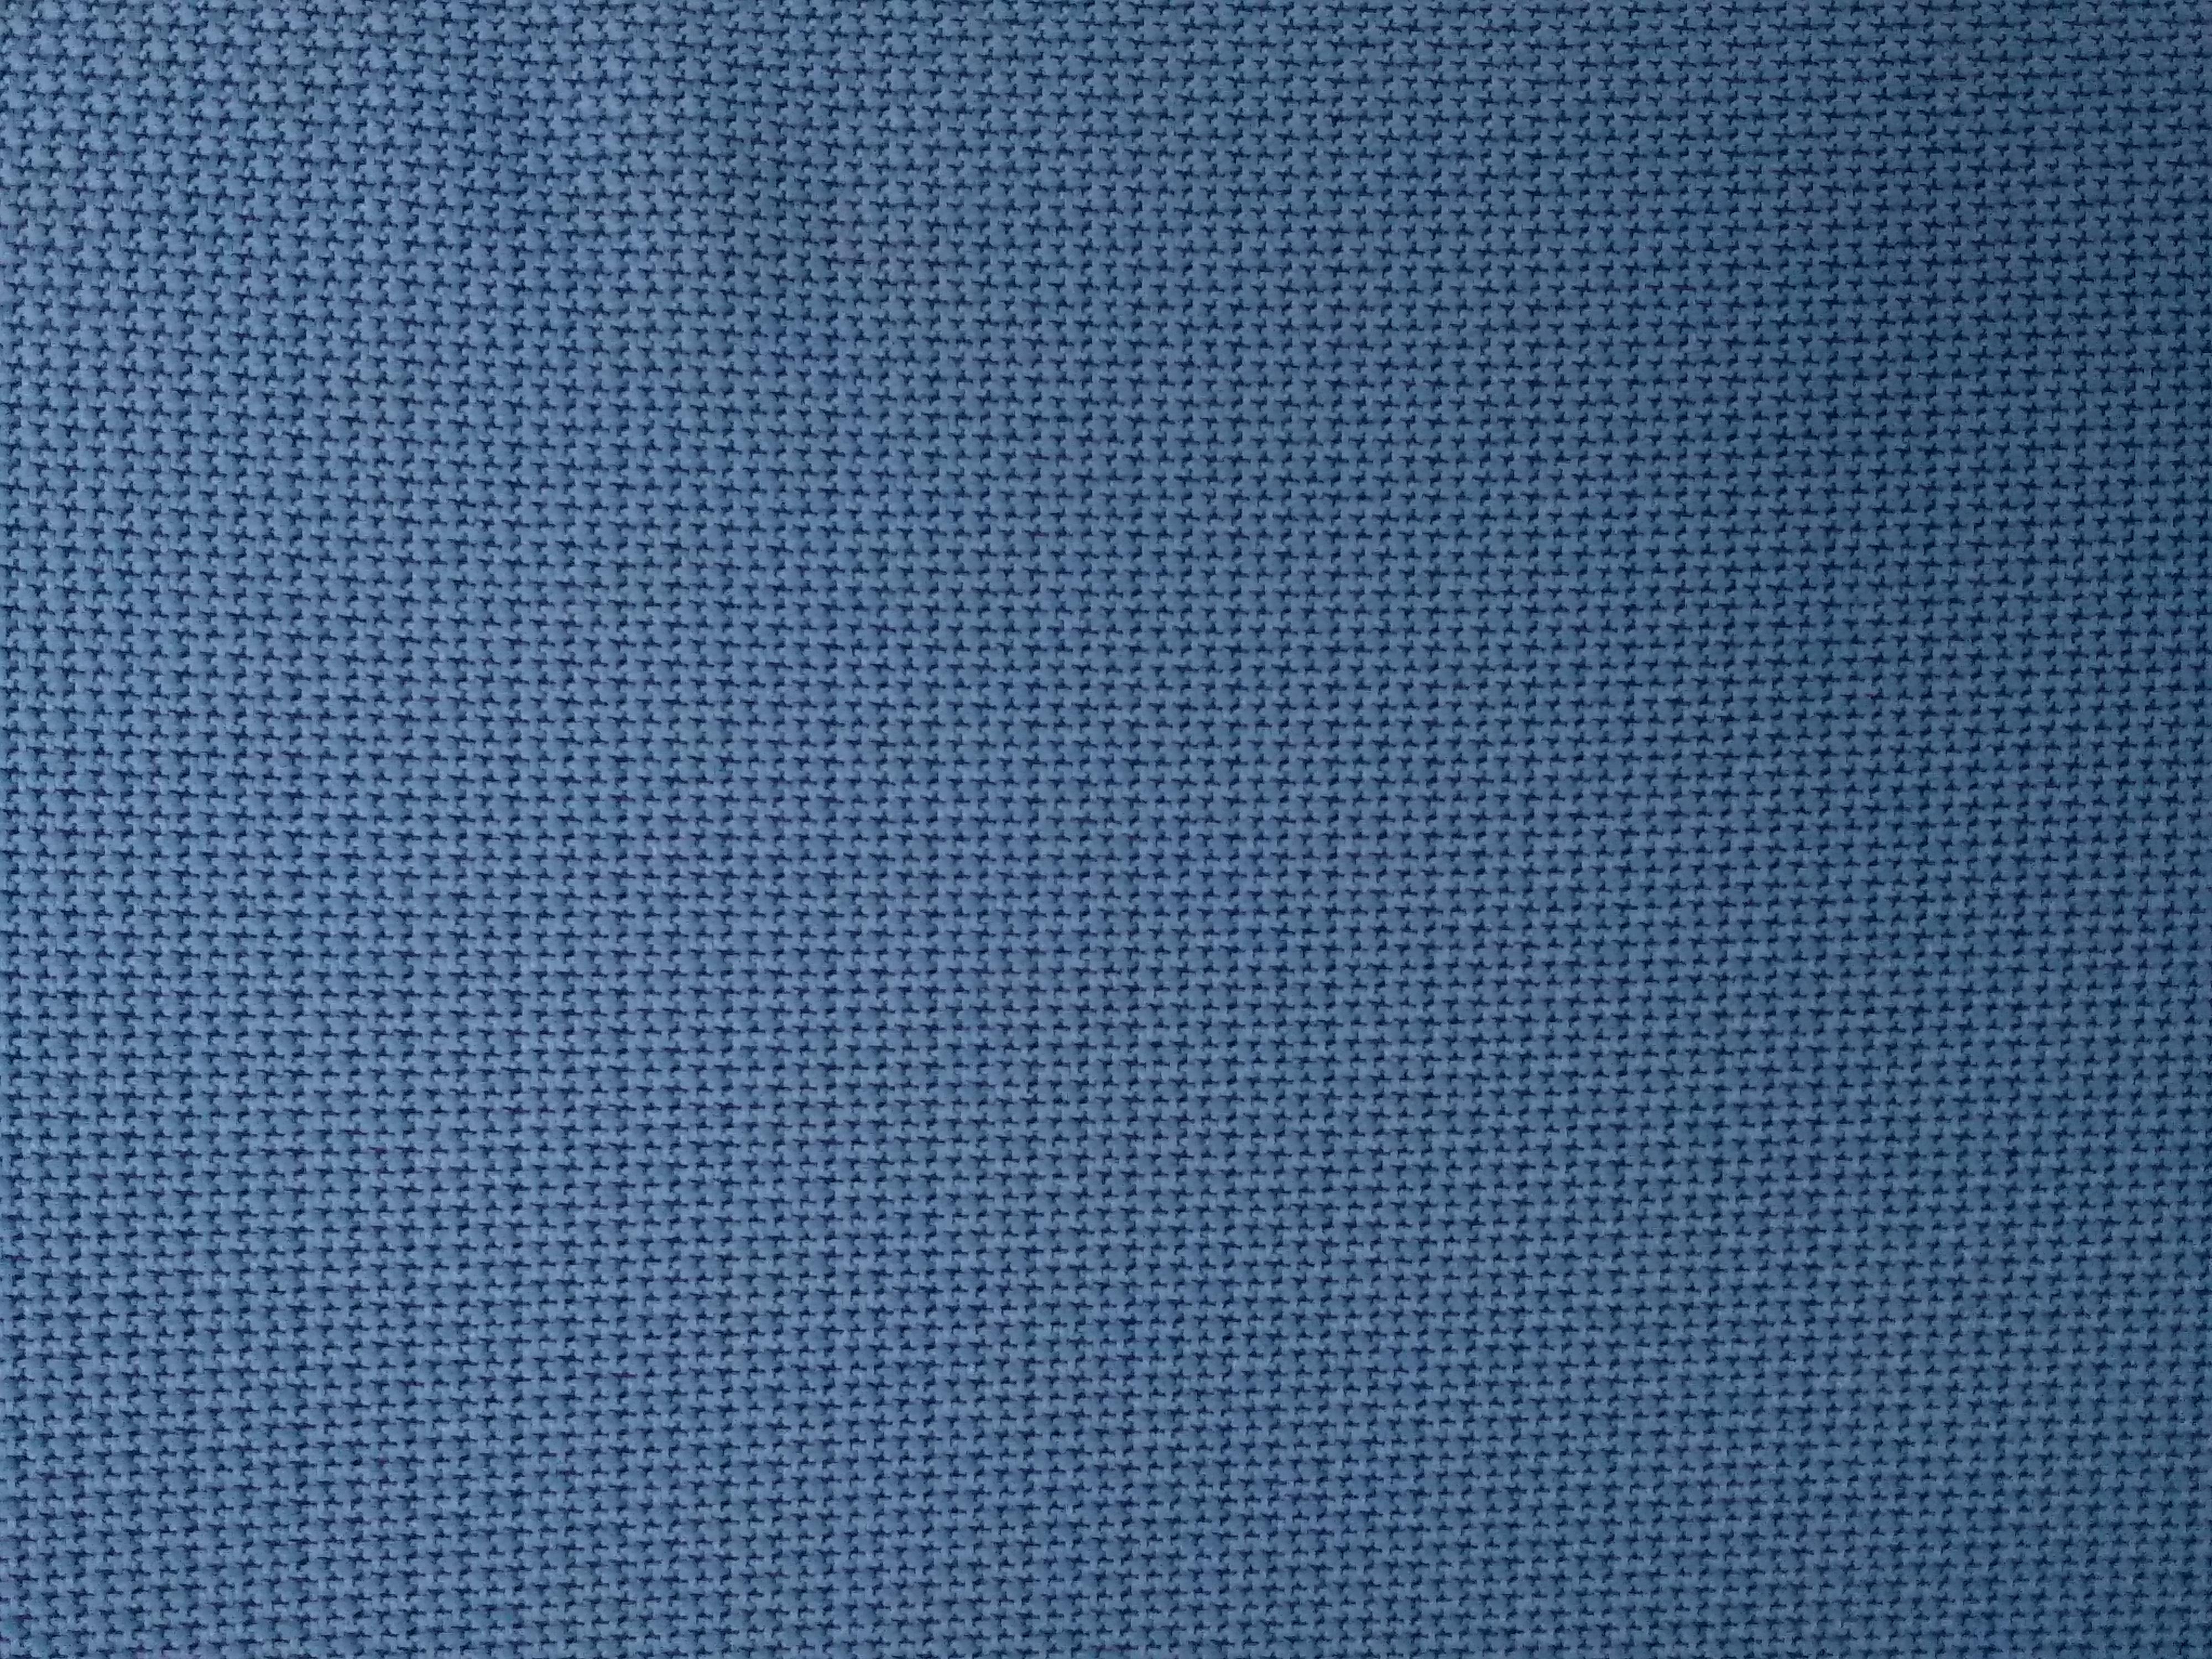 בד כחול ג'ינס אביב 3